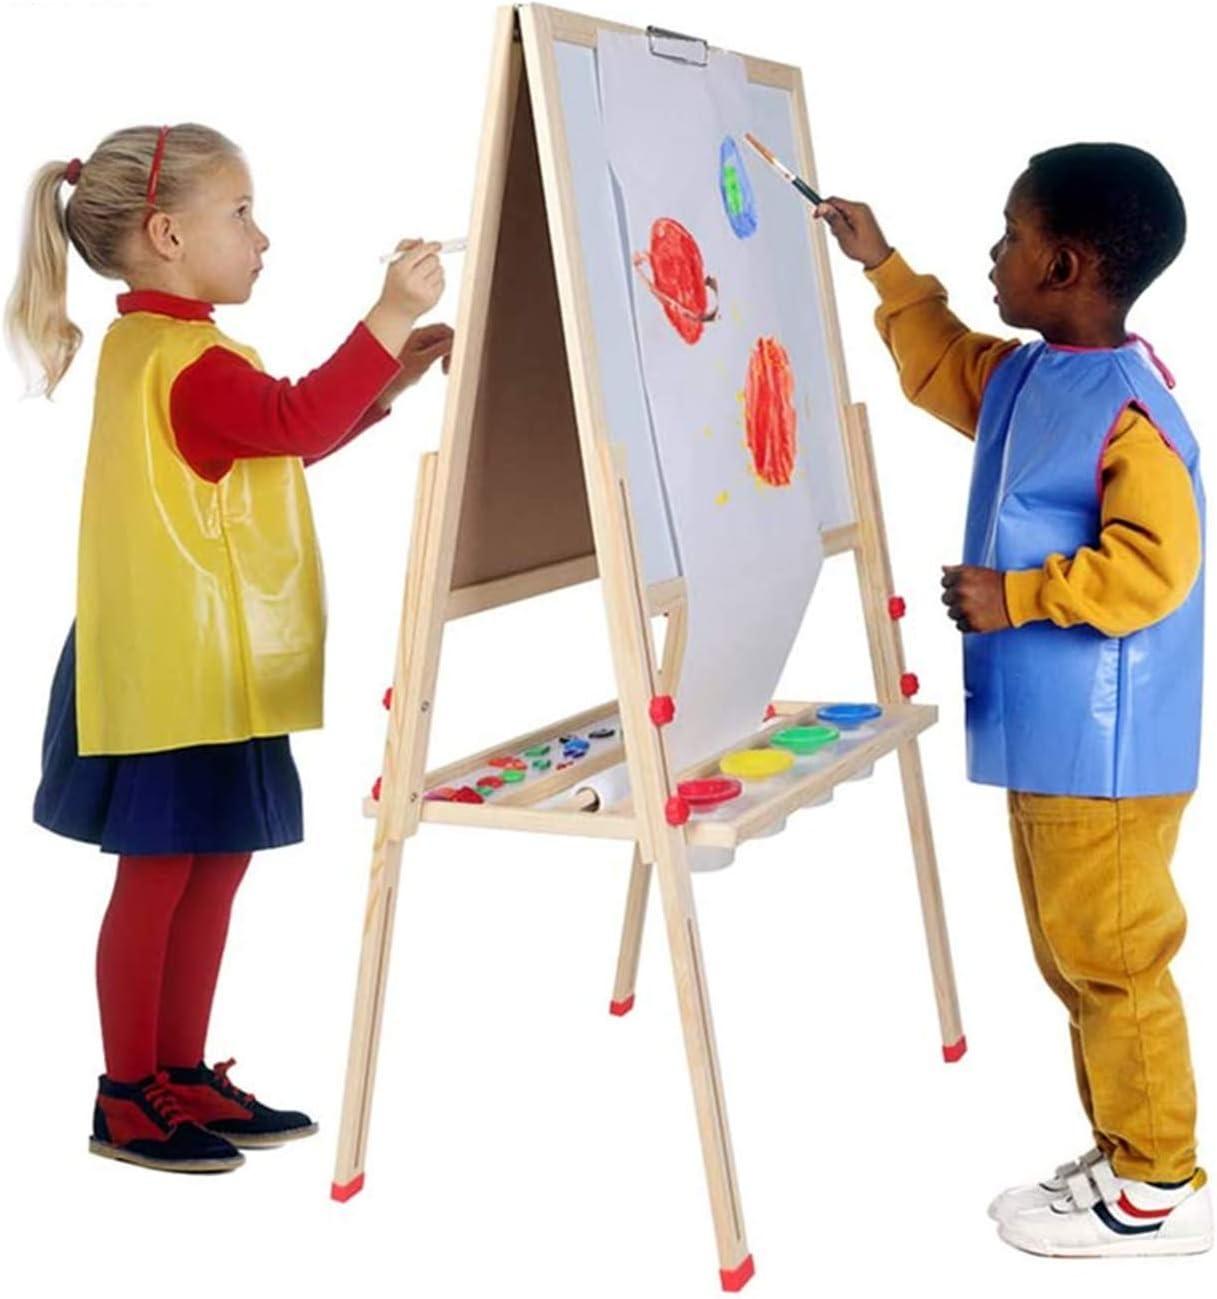 CHILDRENS WOODEN DOUBLE SIDED EASEL BLACKBOARD MAGNETIC KIDS